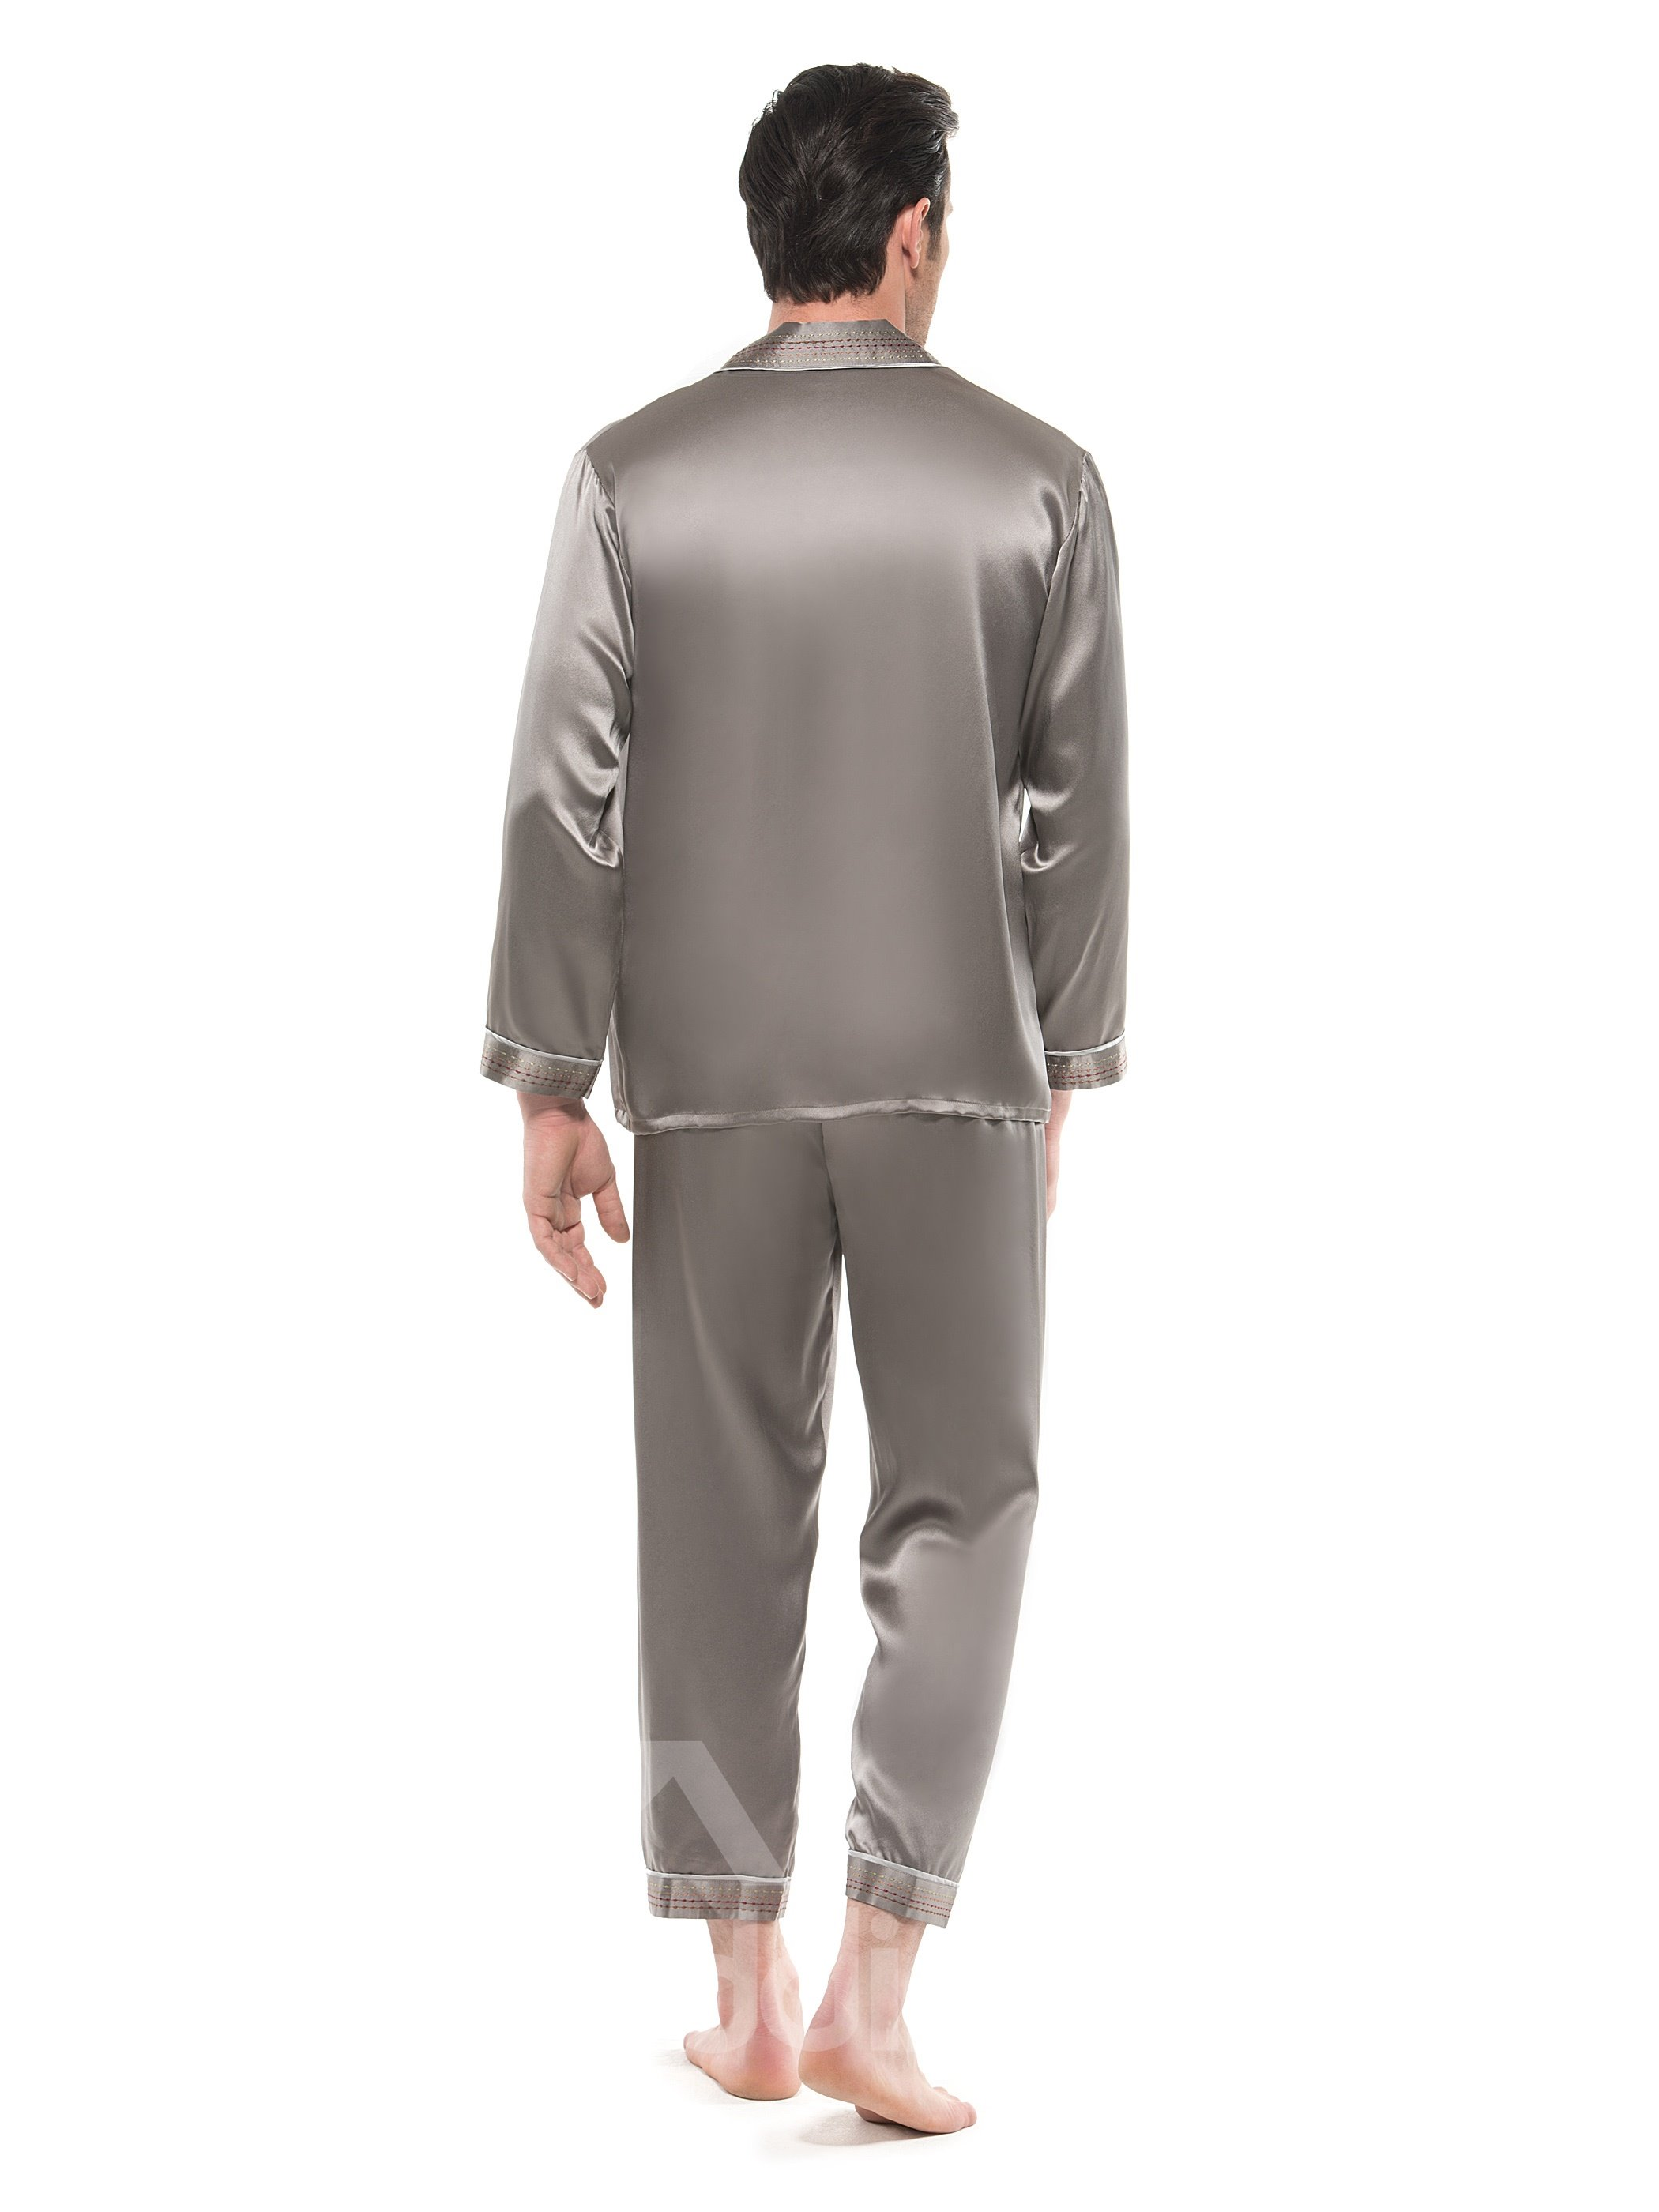 Unique Embroidery Edge Open Collar Men Silk Pajamas